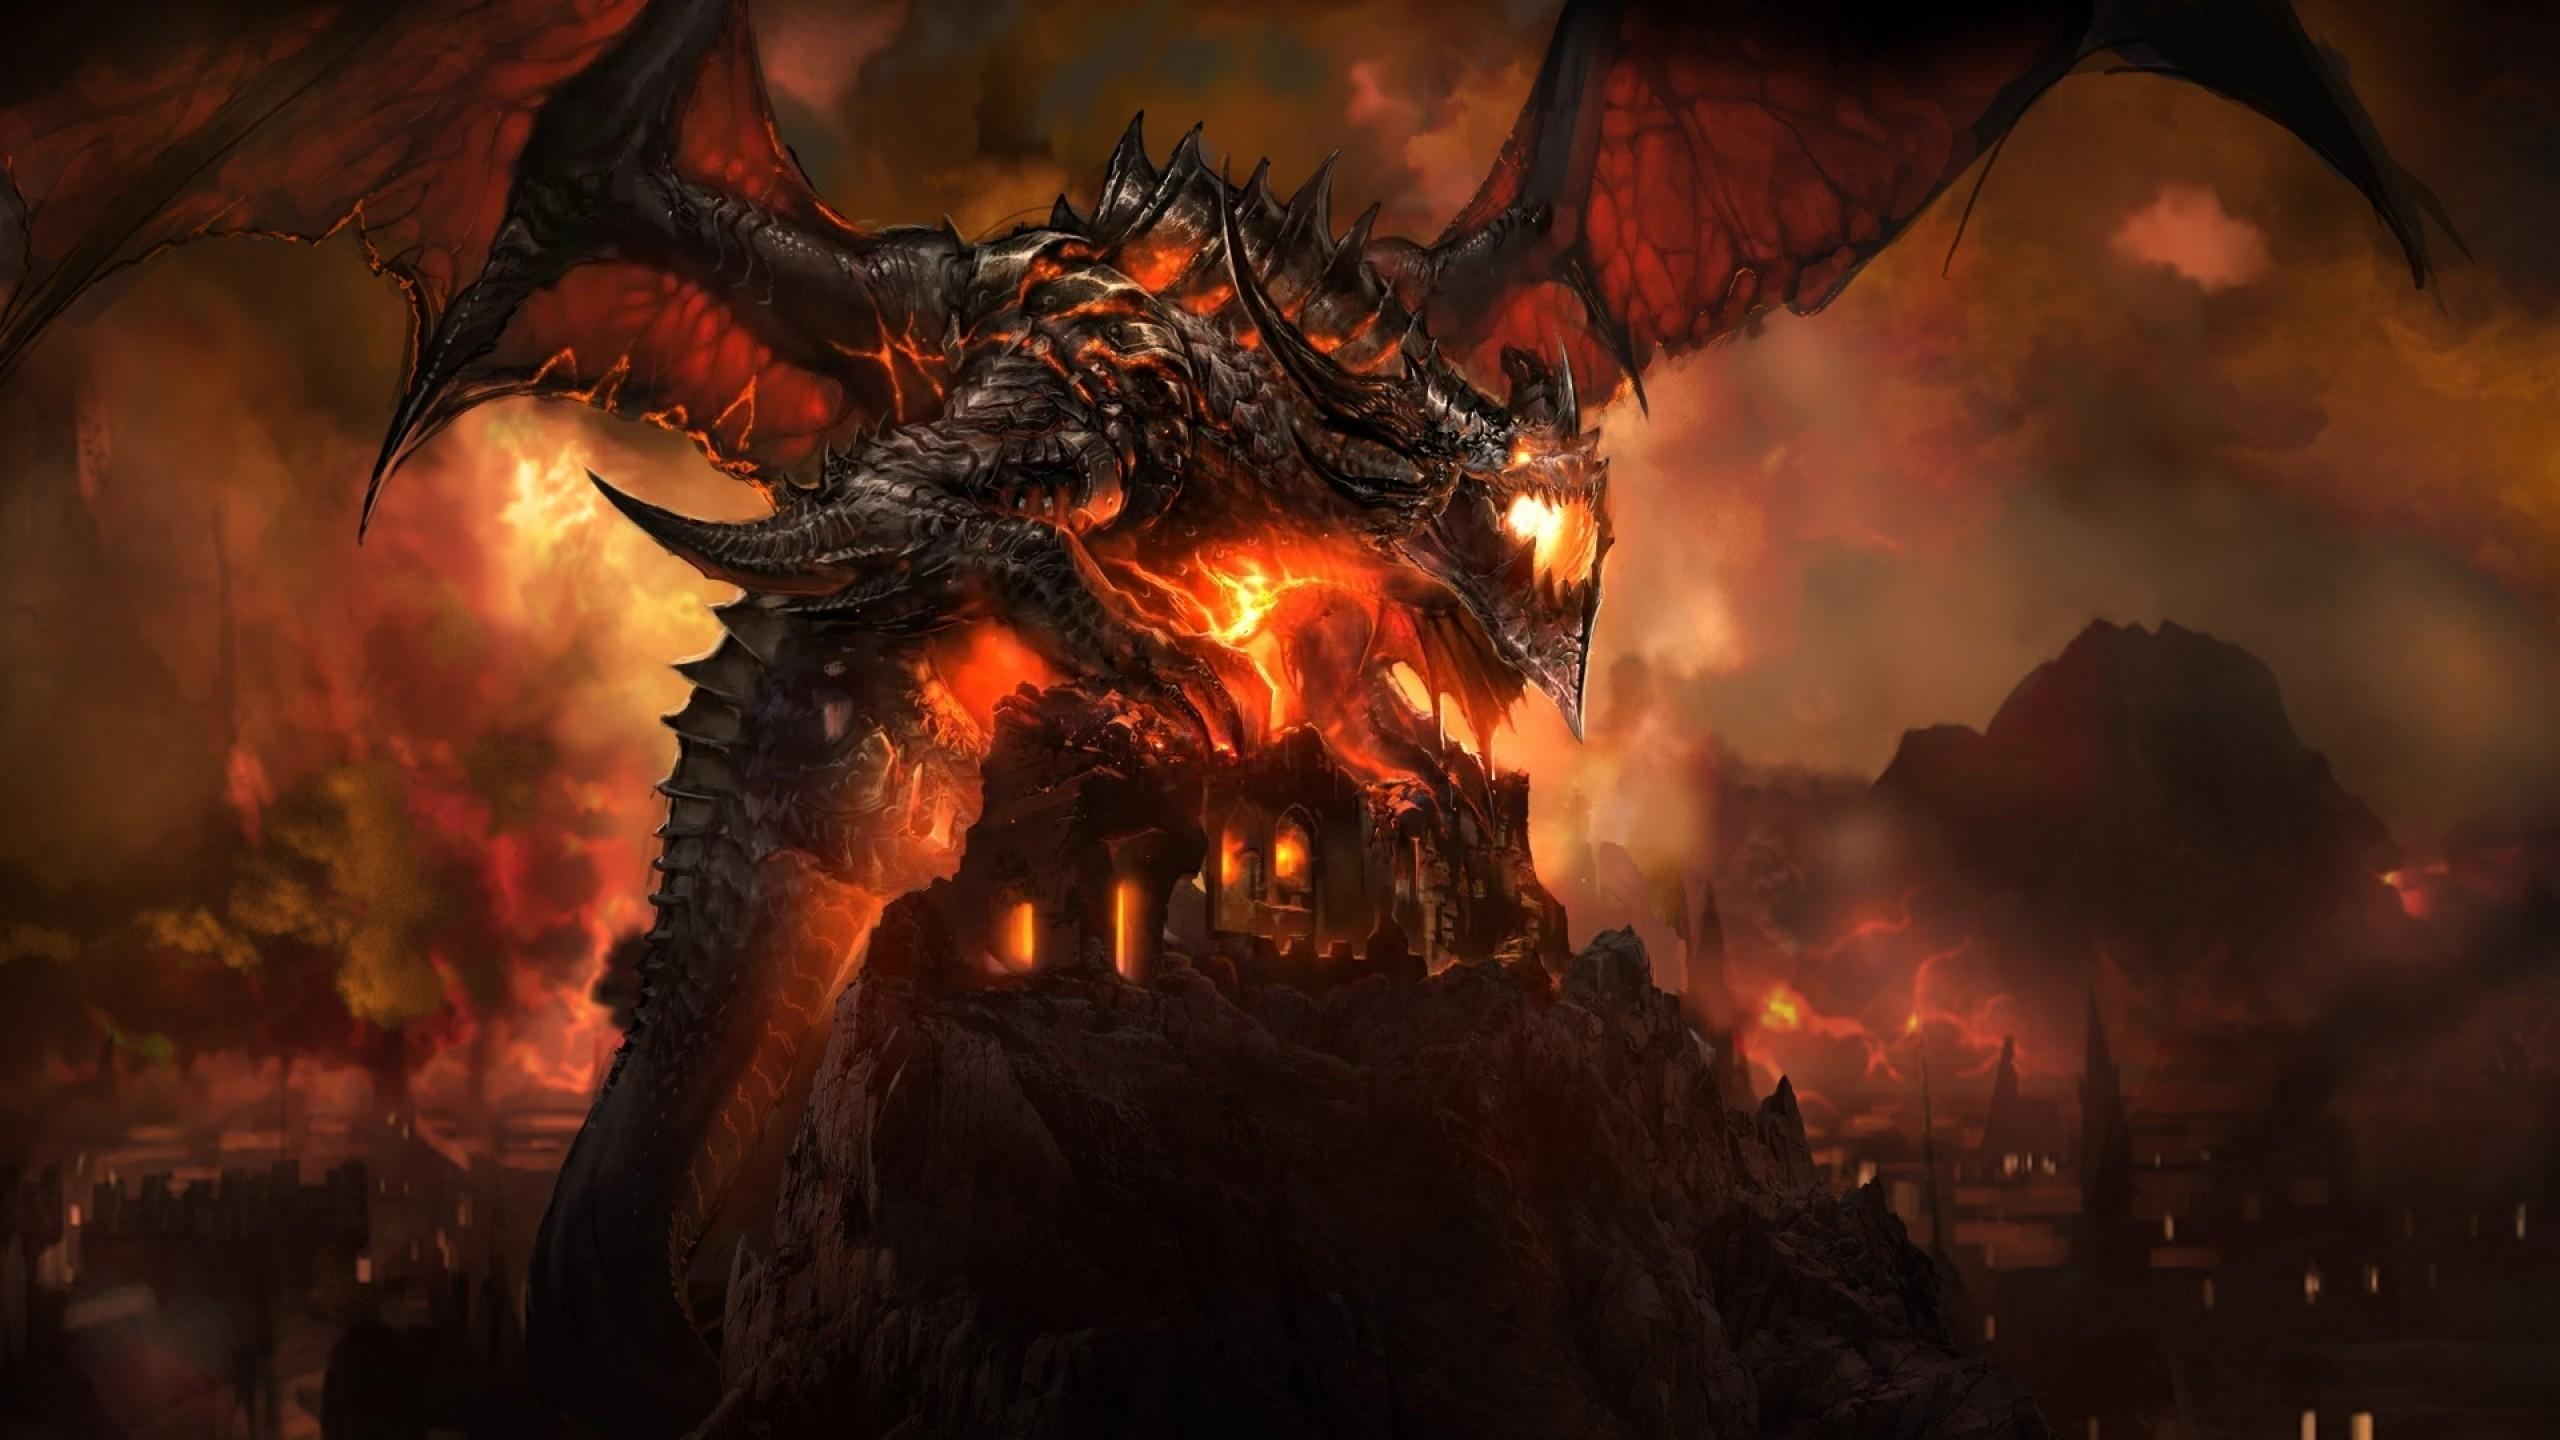 Title Cool Fire Dragons Wallpaper 1413282 Dimension 2560 X 1440 File Type JPG JPEG